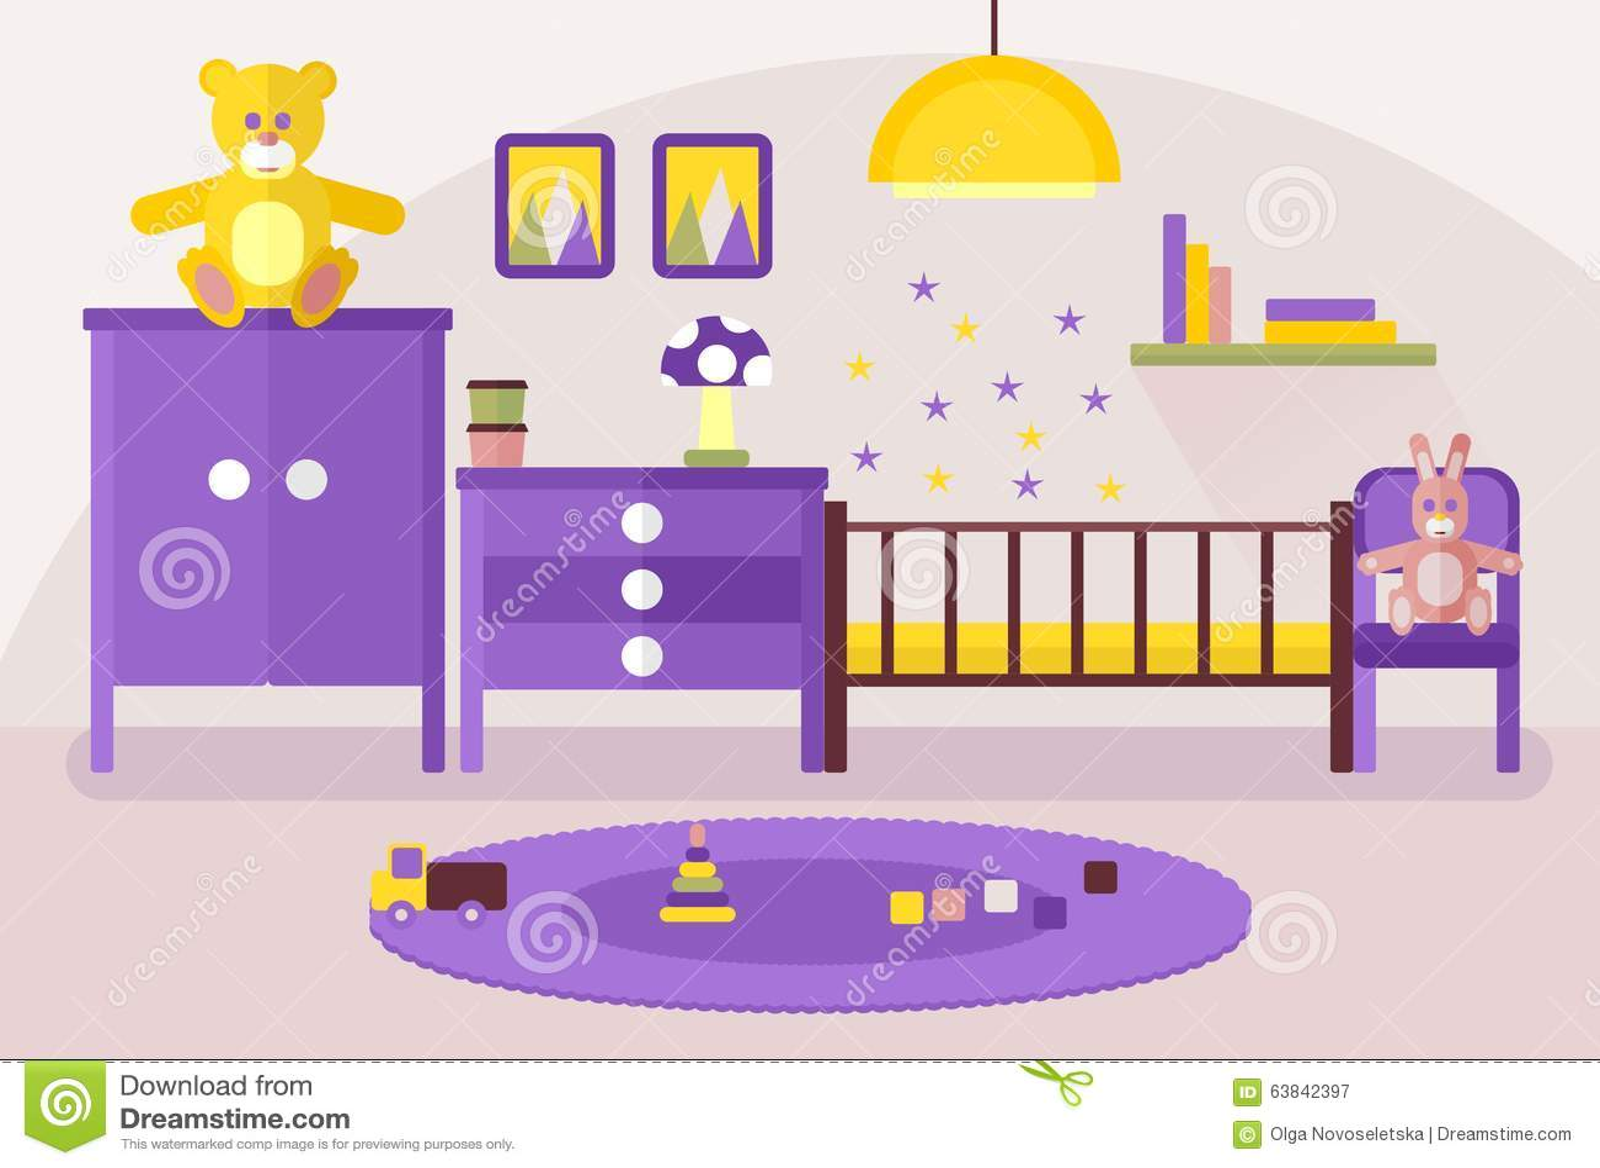 Living Room Vector Illustration Free